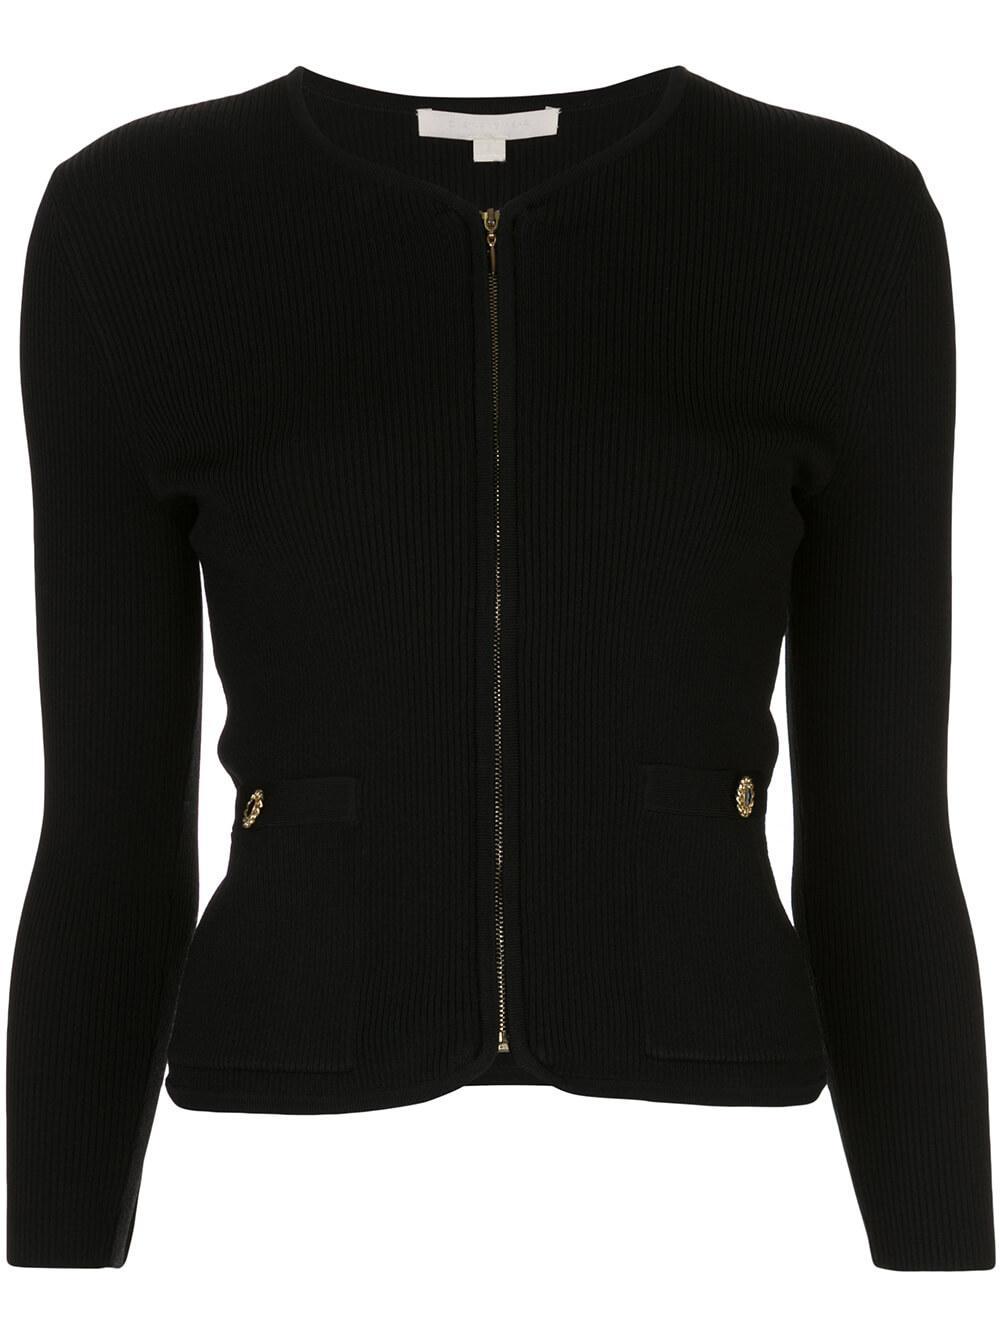 Long Sleeve Rib Knit Zip - Up Jacket Item # 120-6000-K